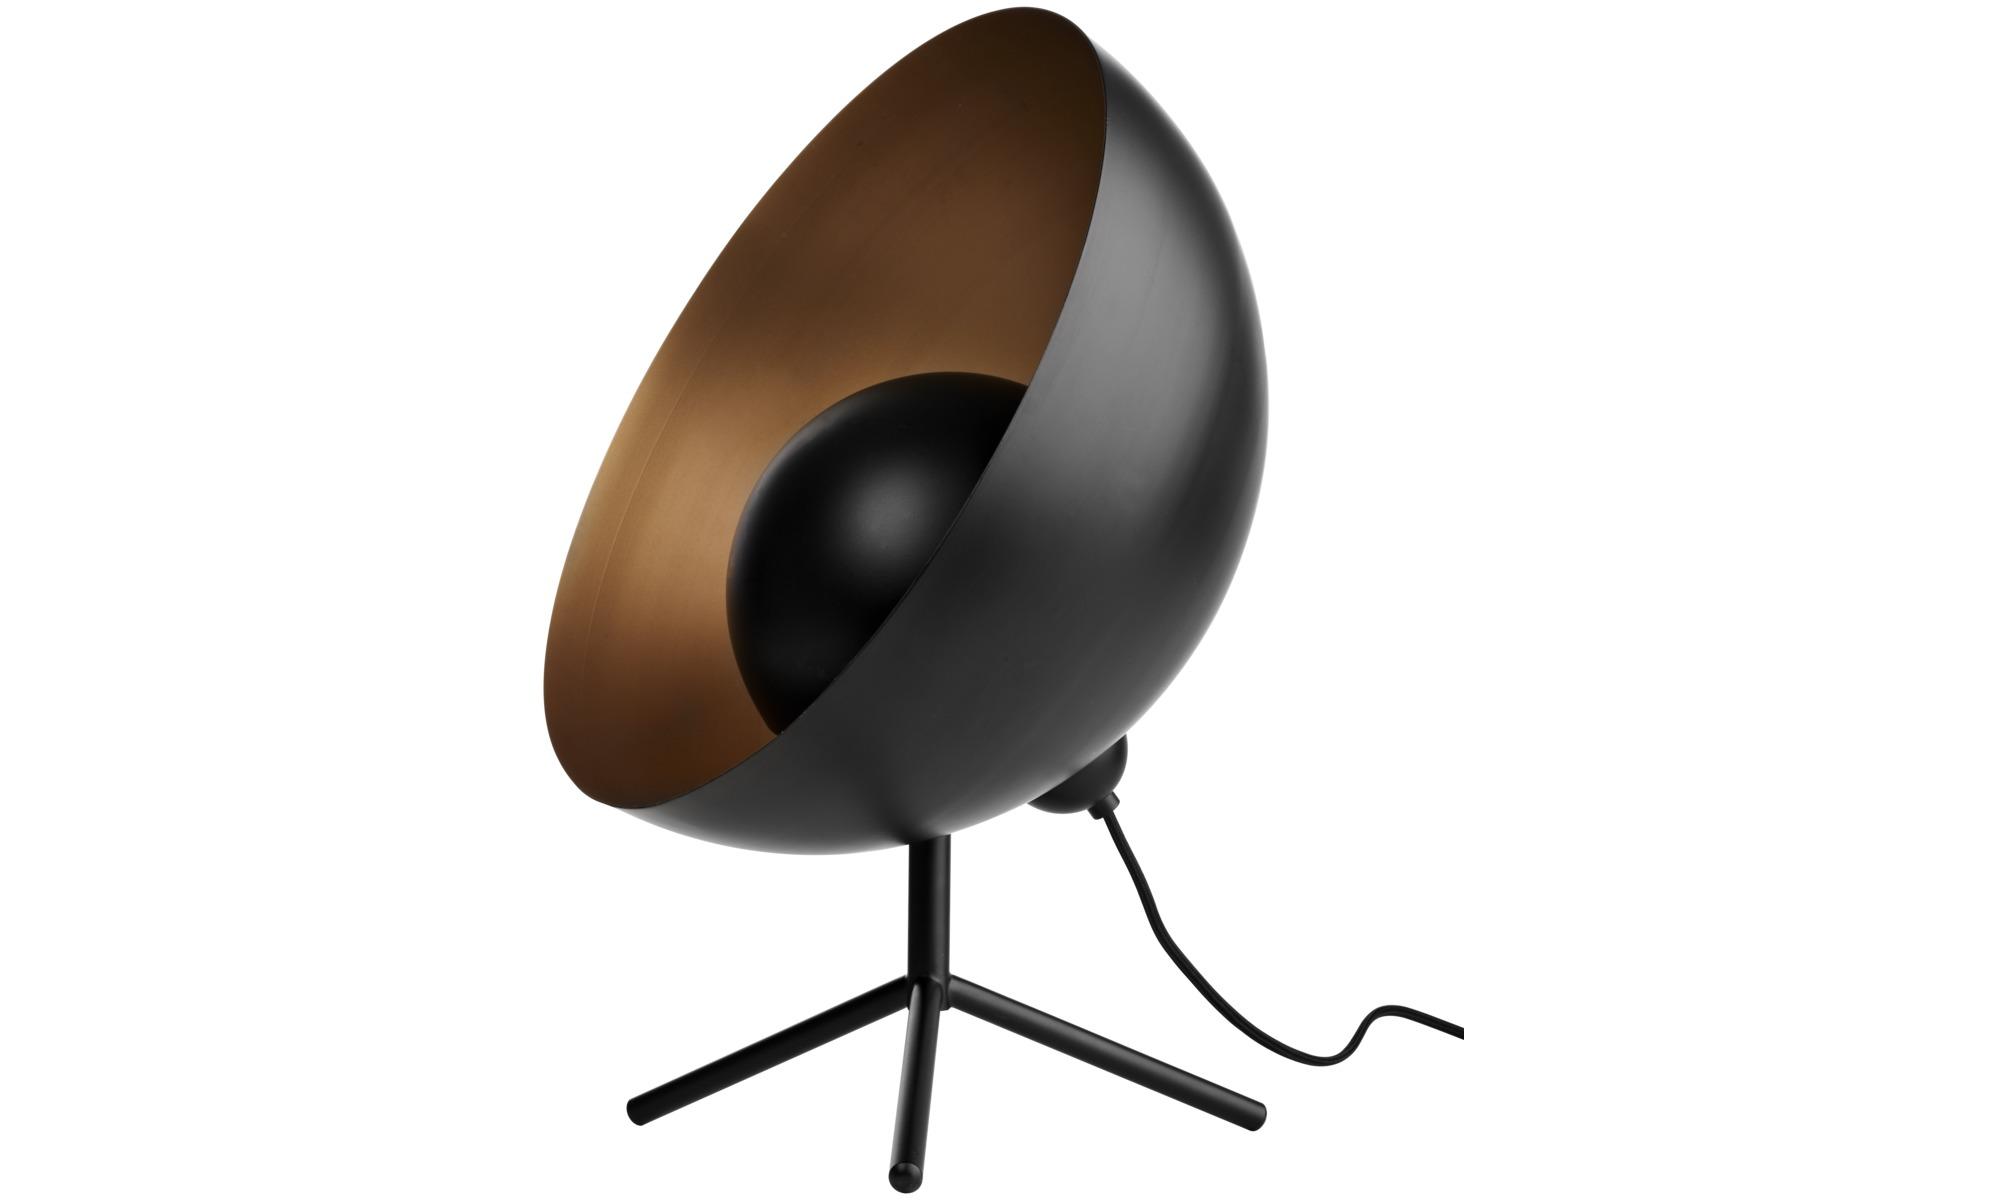 Lampy - Lampa stołowa Satellite - Czarny - Metal